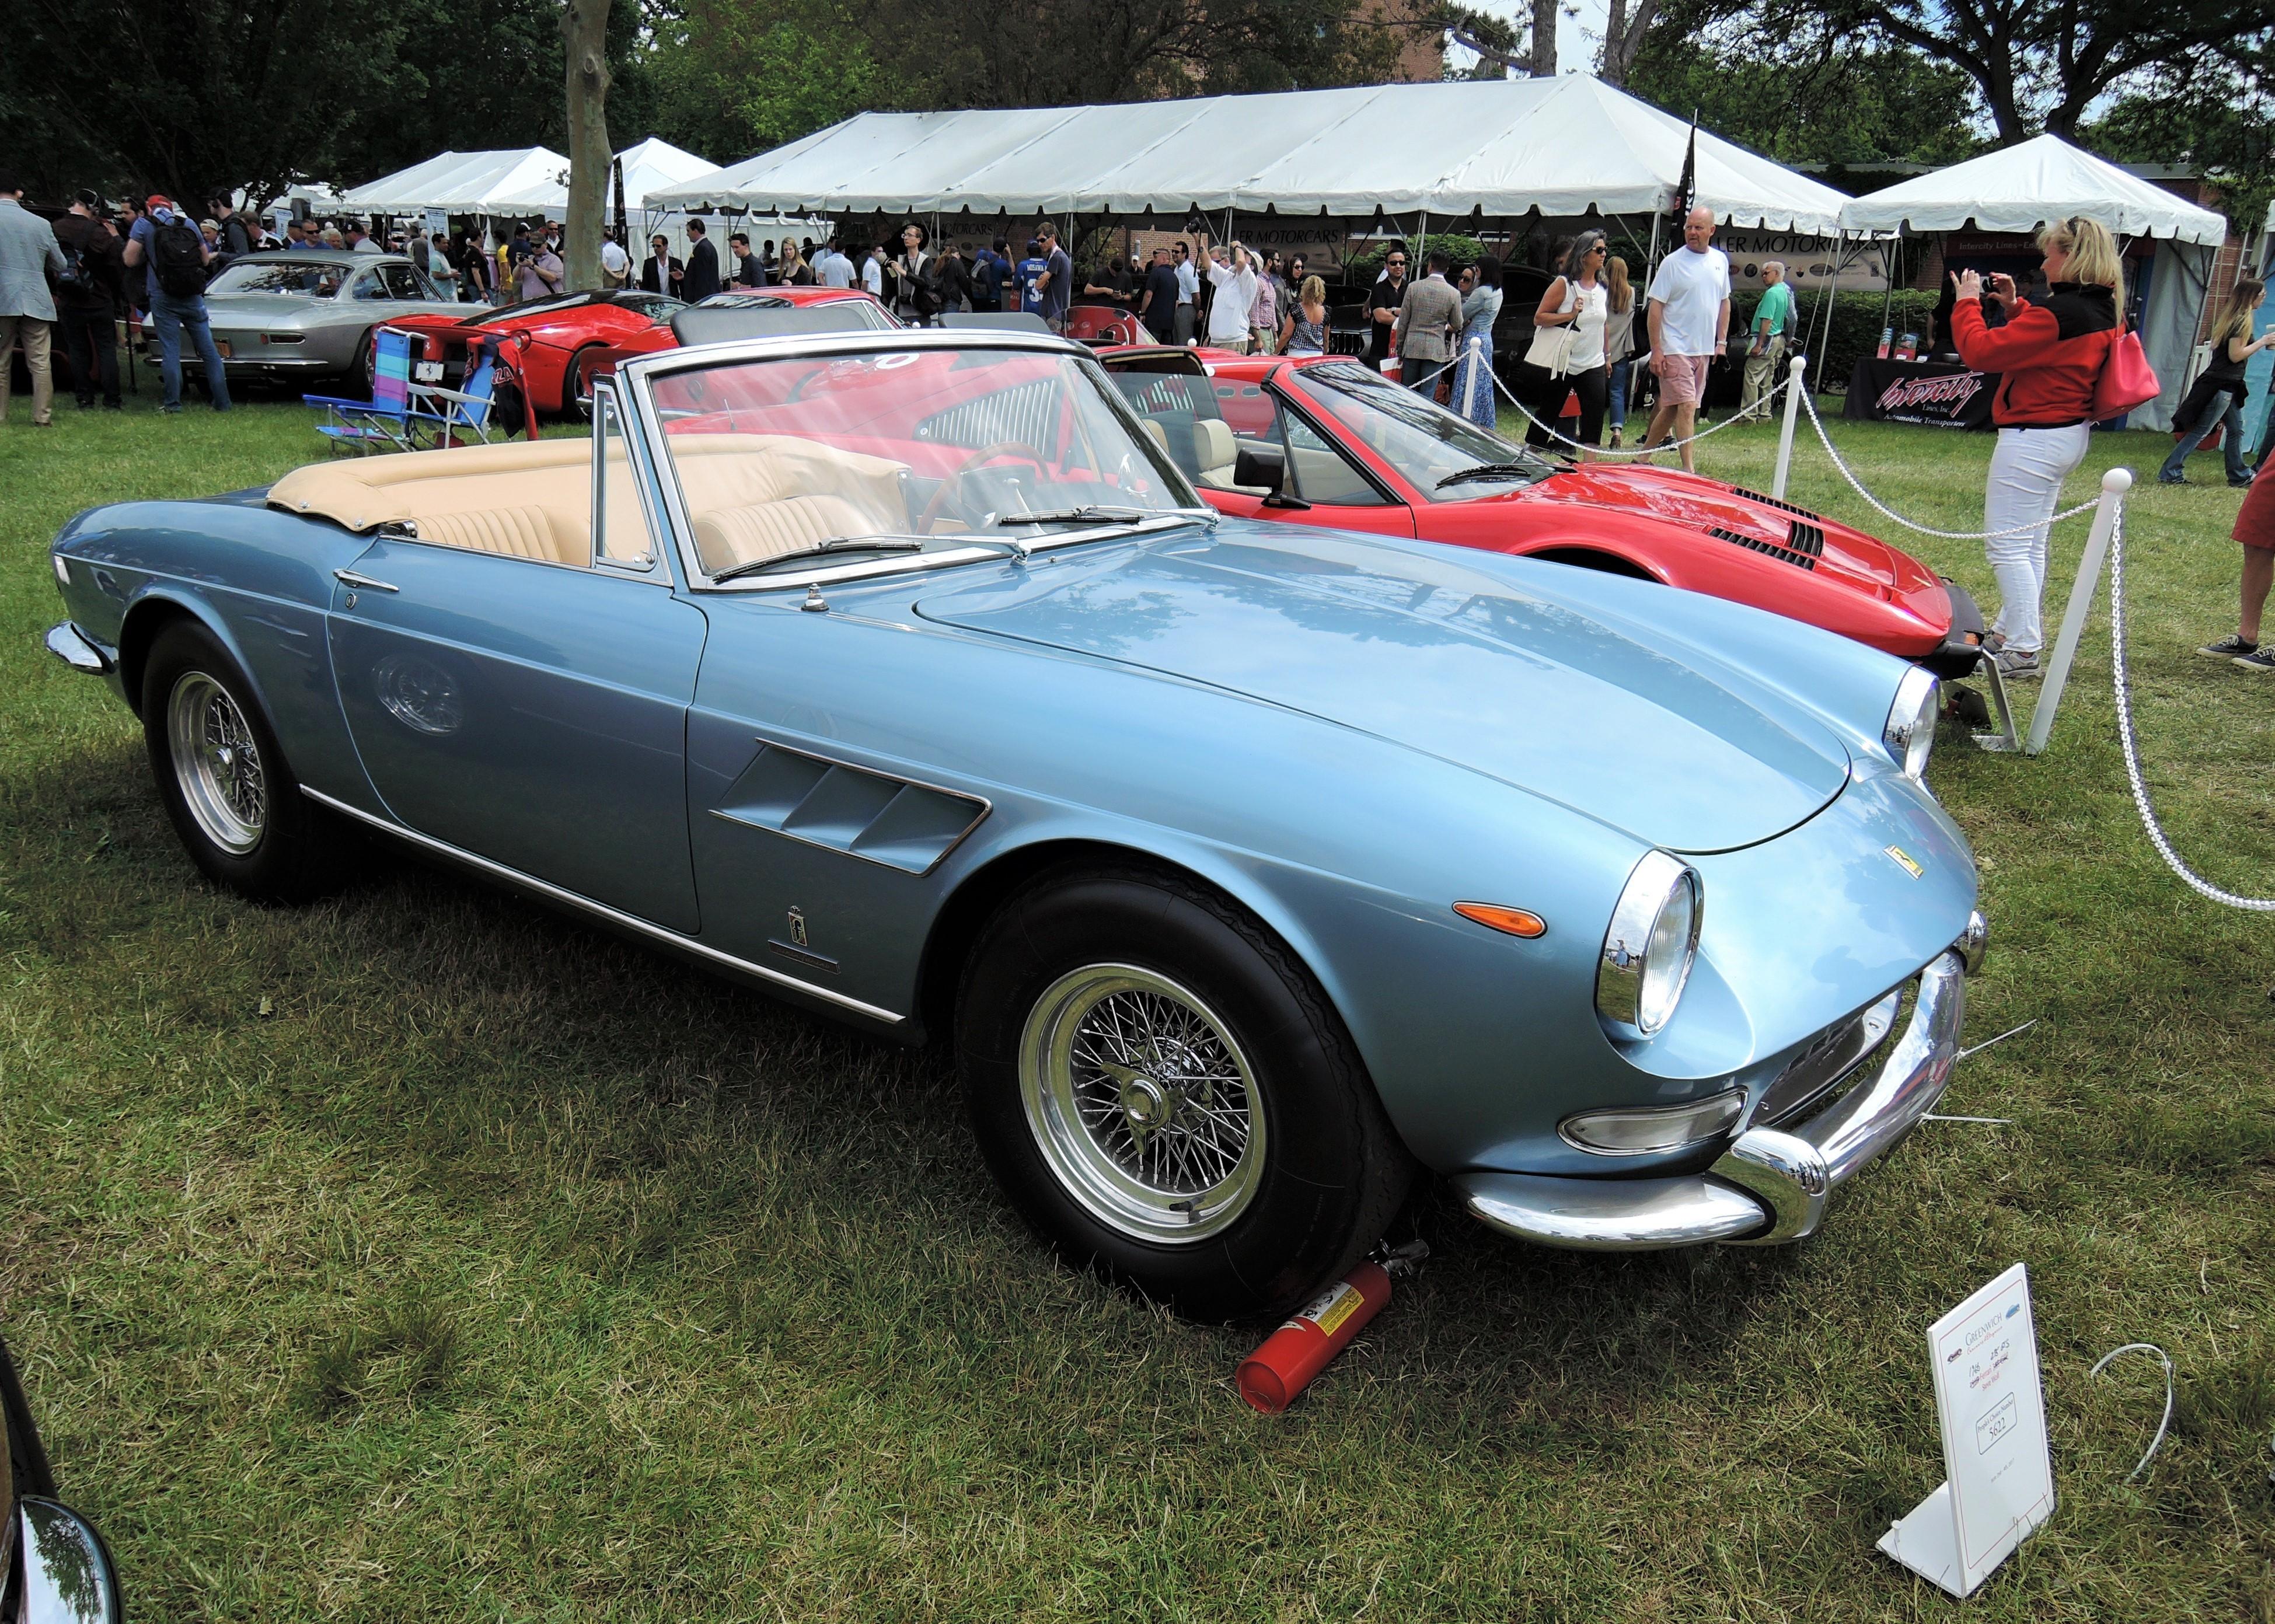 blue 1966 Ferrari 275 GTS - Greenwich Concours d'Elegance 2017